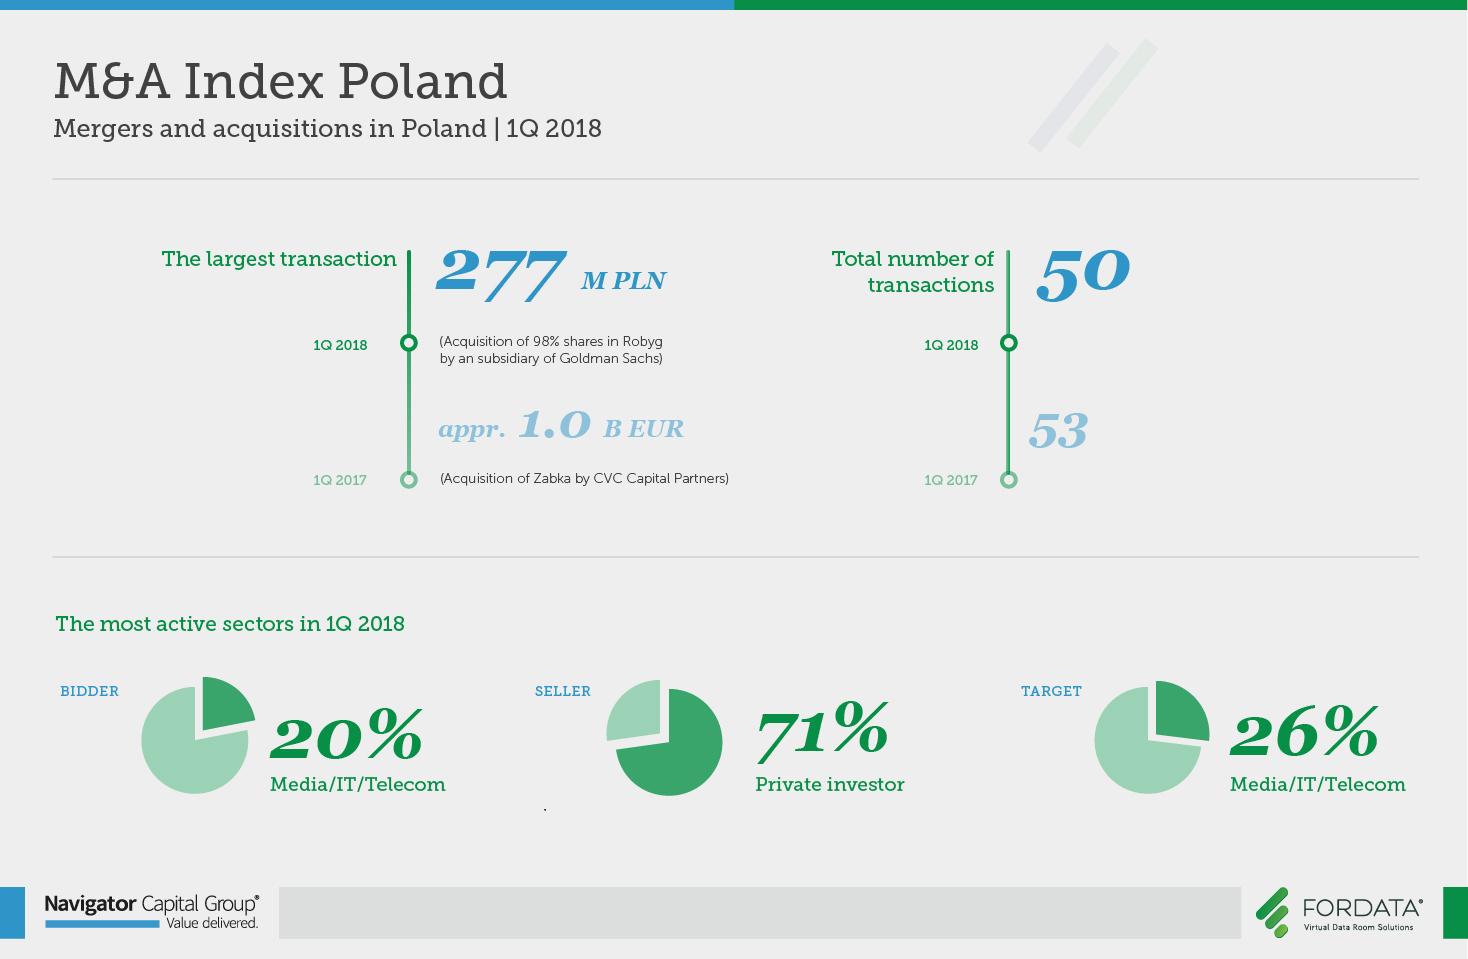 Raport M&A Index Poland 1 kwartał/1Q 2018 - FORDATA